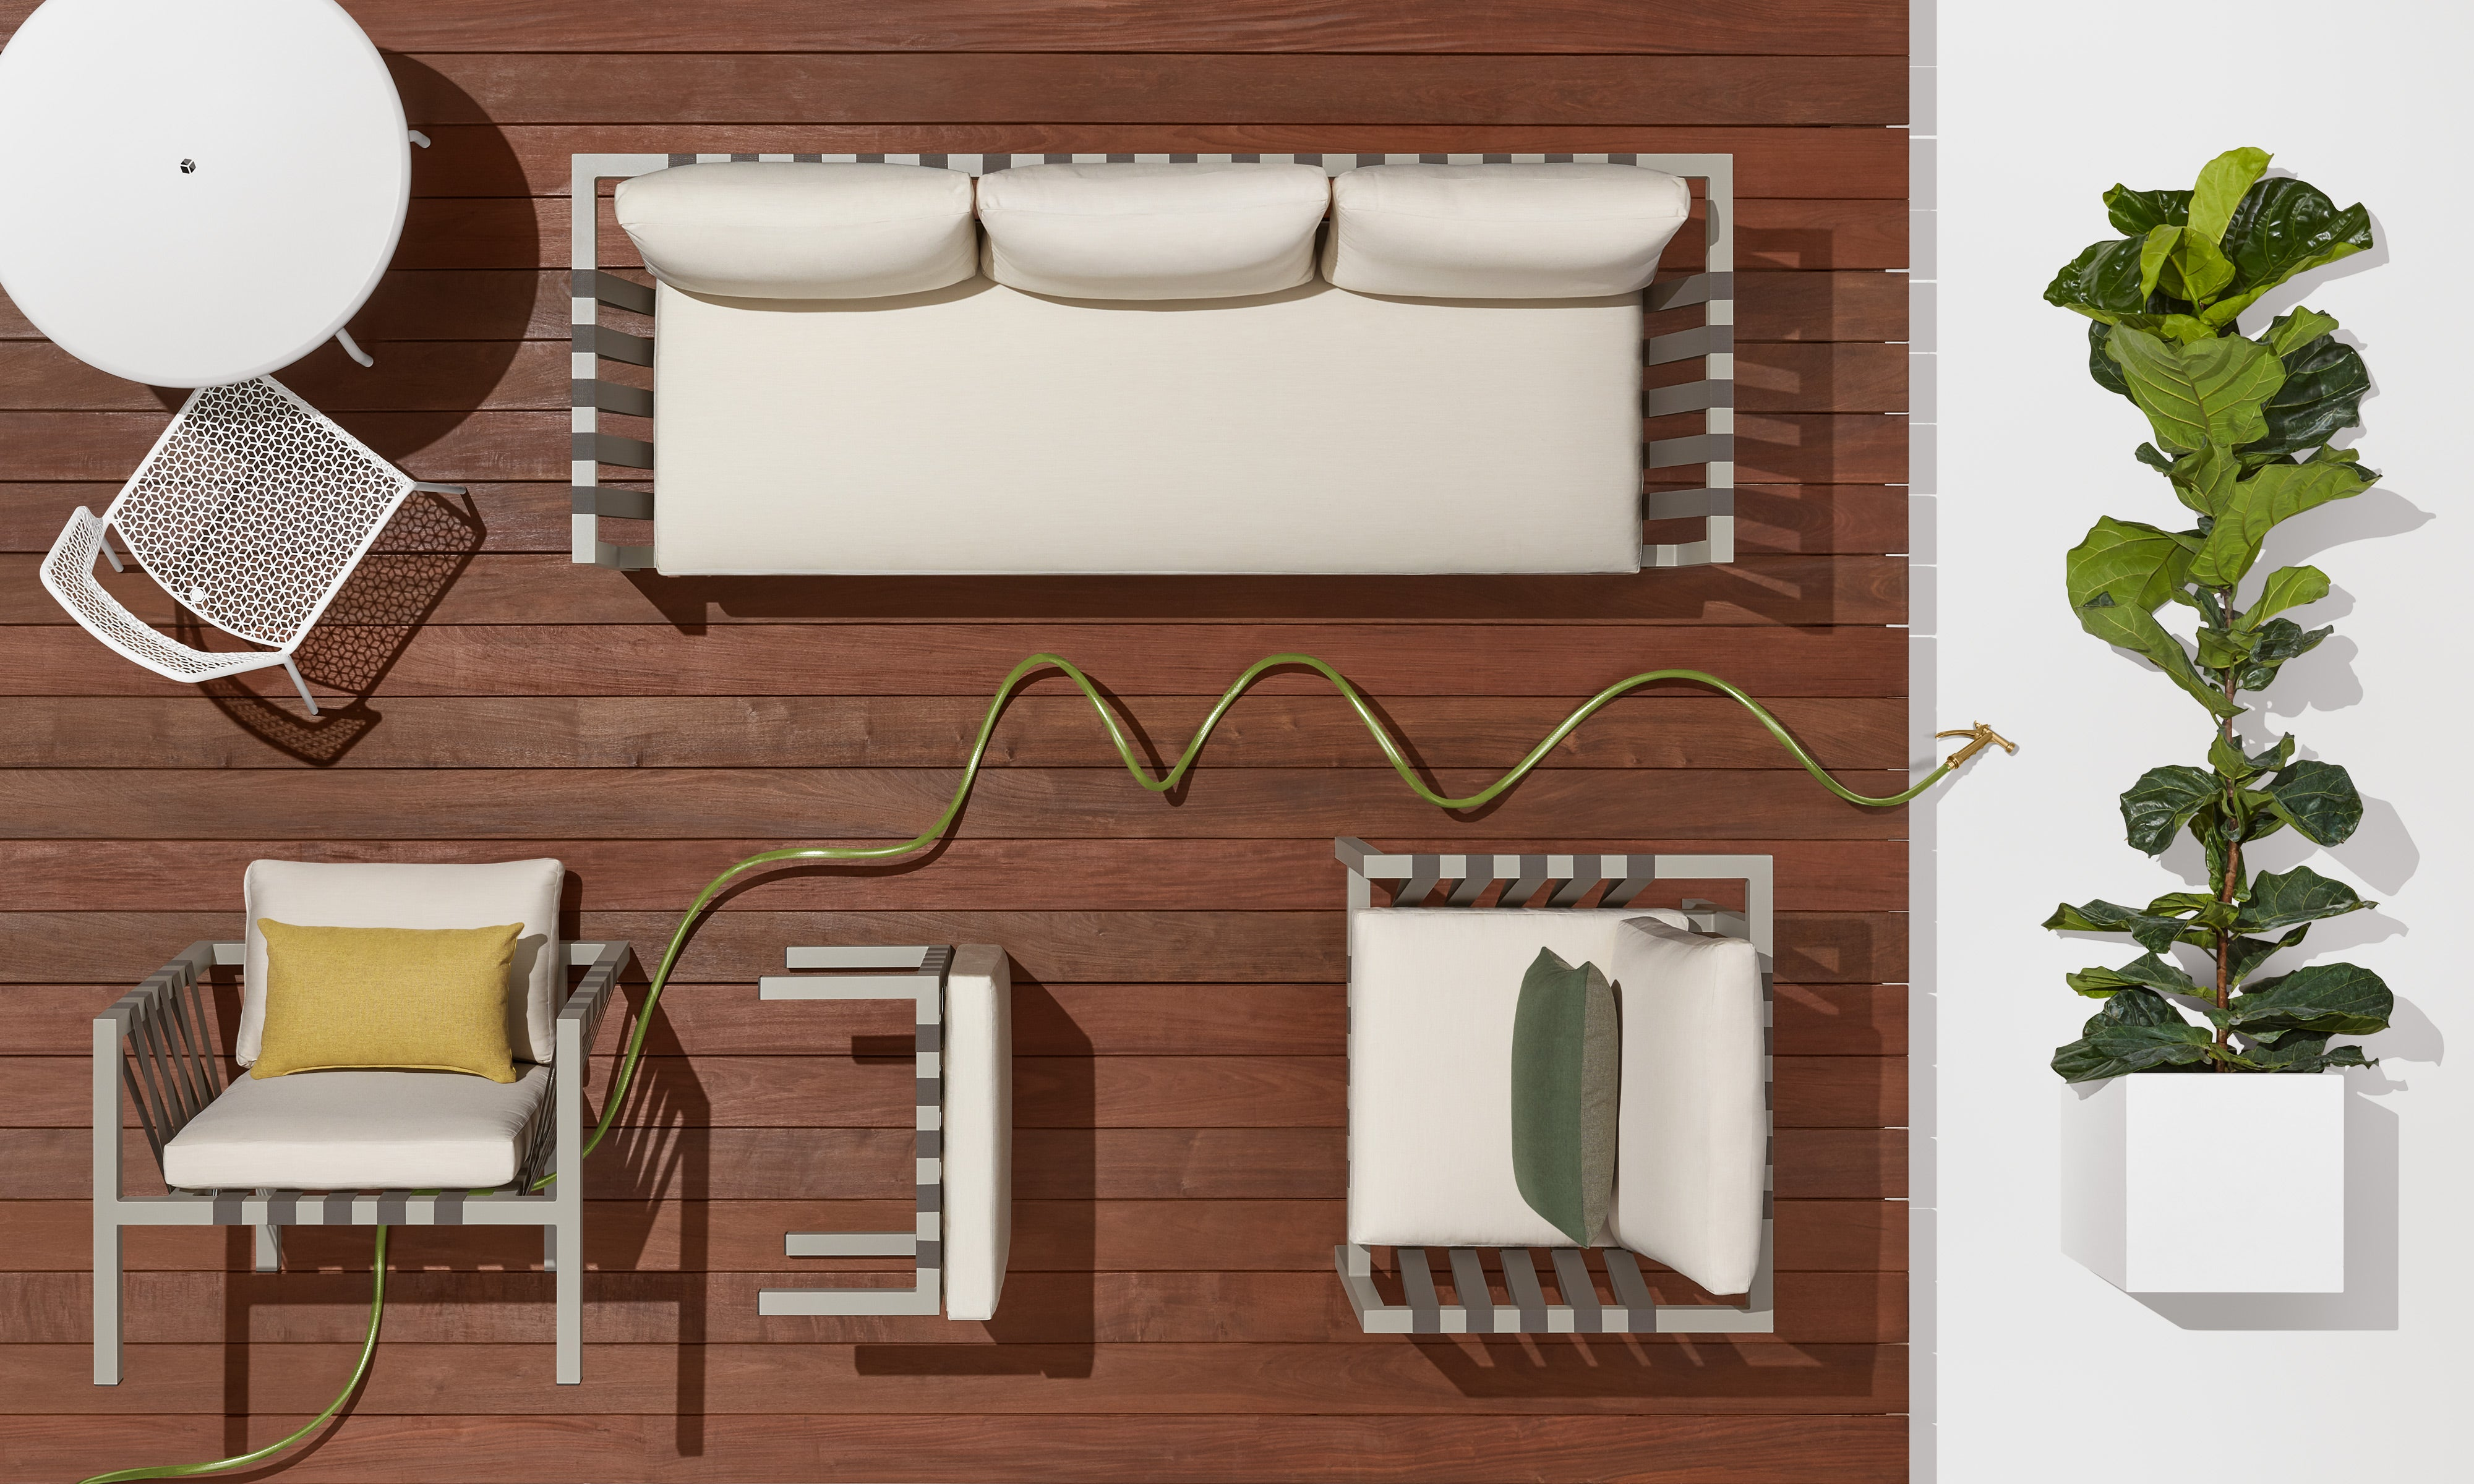 Jibe 3 Seat Outdoor Sofa